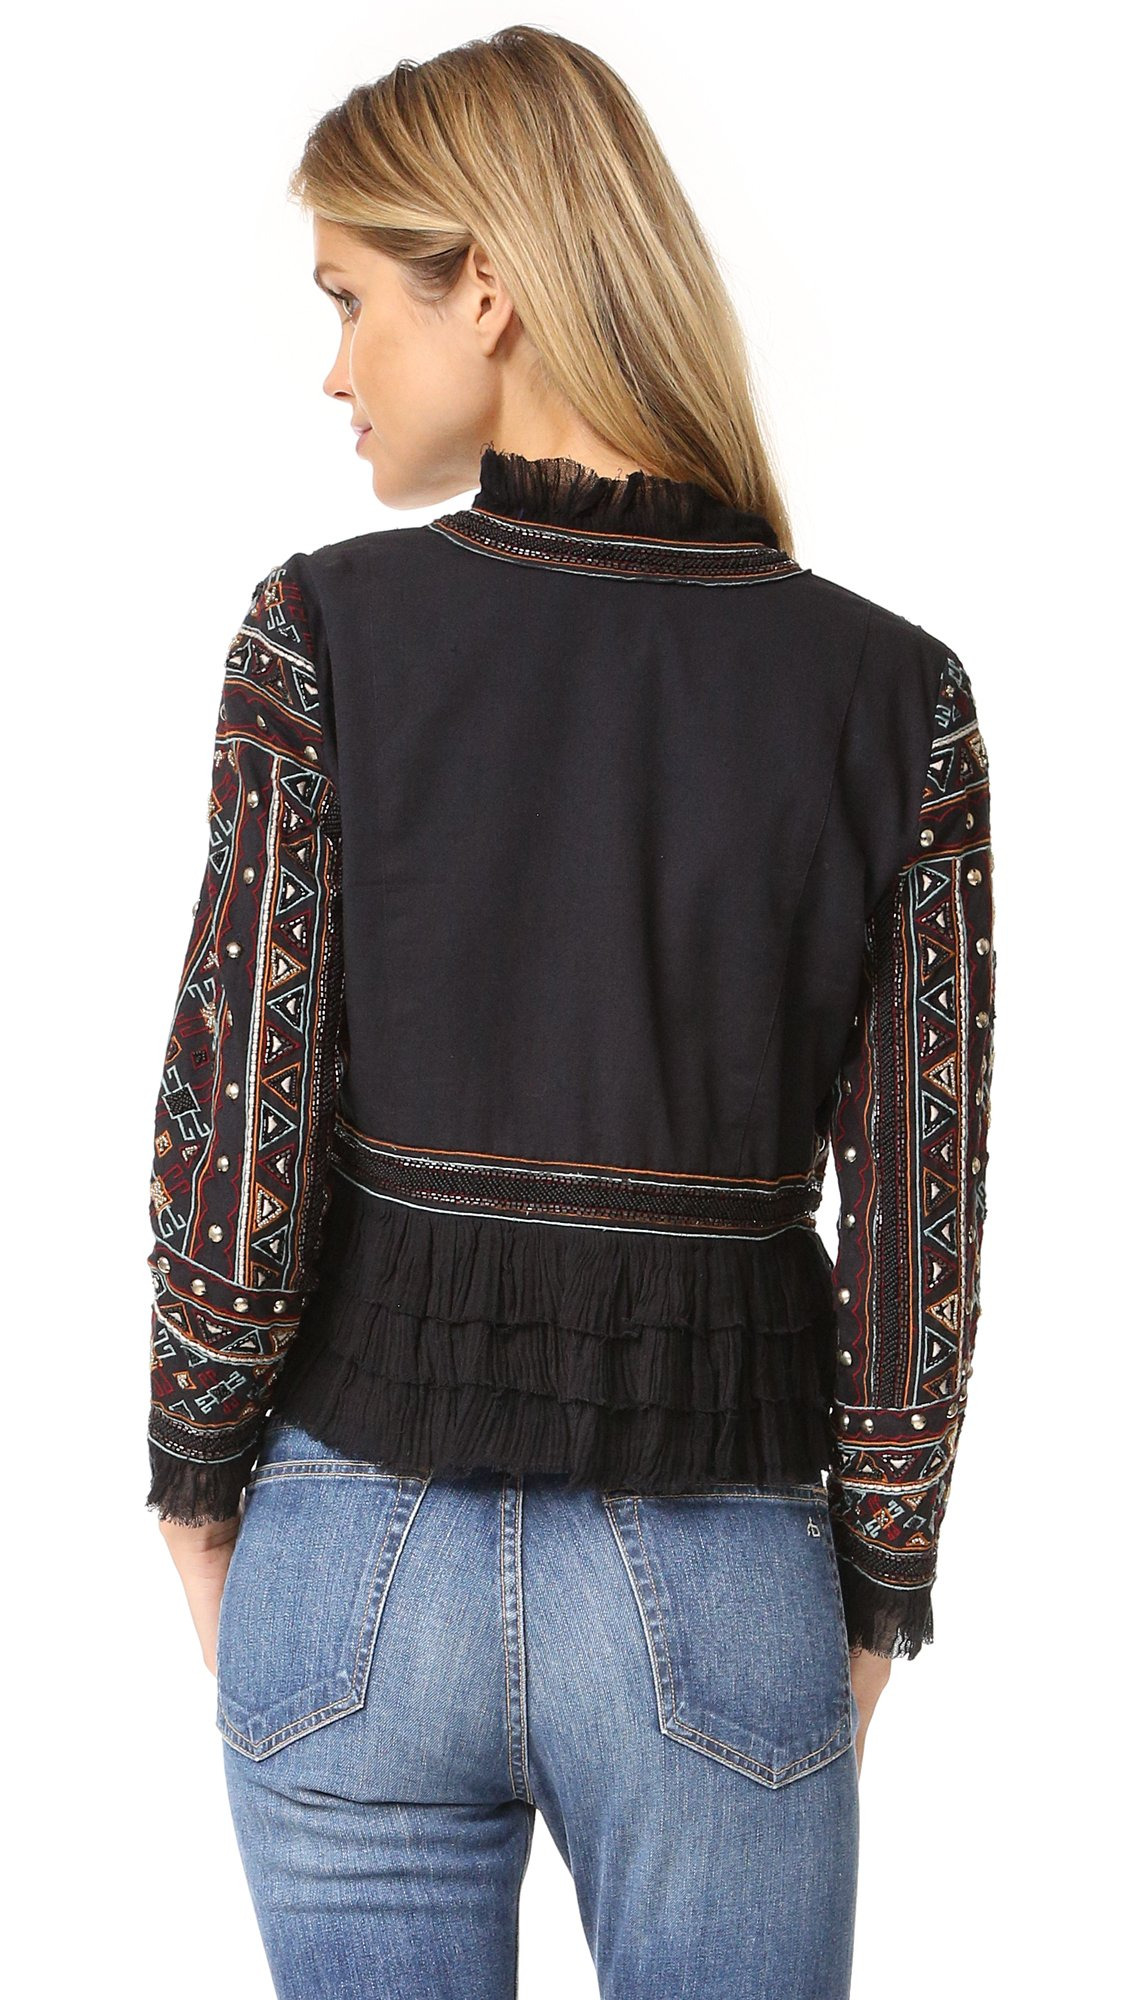 Love Sam Vannes Embroidered Jacket W/Ruffle Trim, Black, XS by Love Sam Vannes Embroidered Jacket, Black, XS (Image #2)